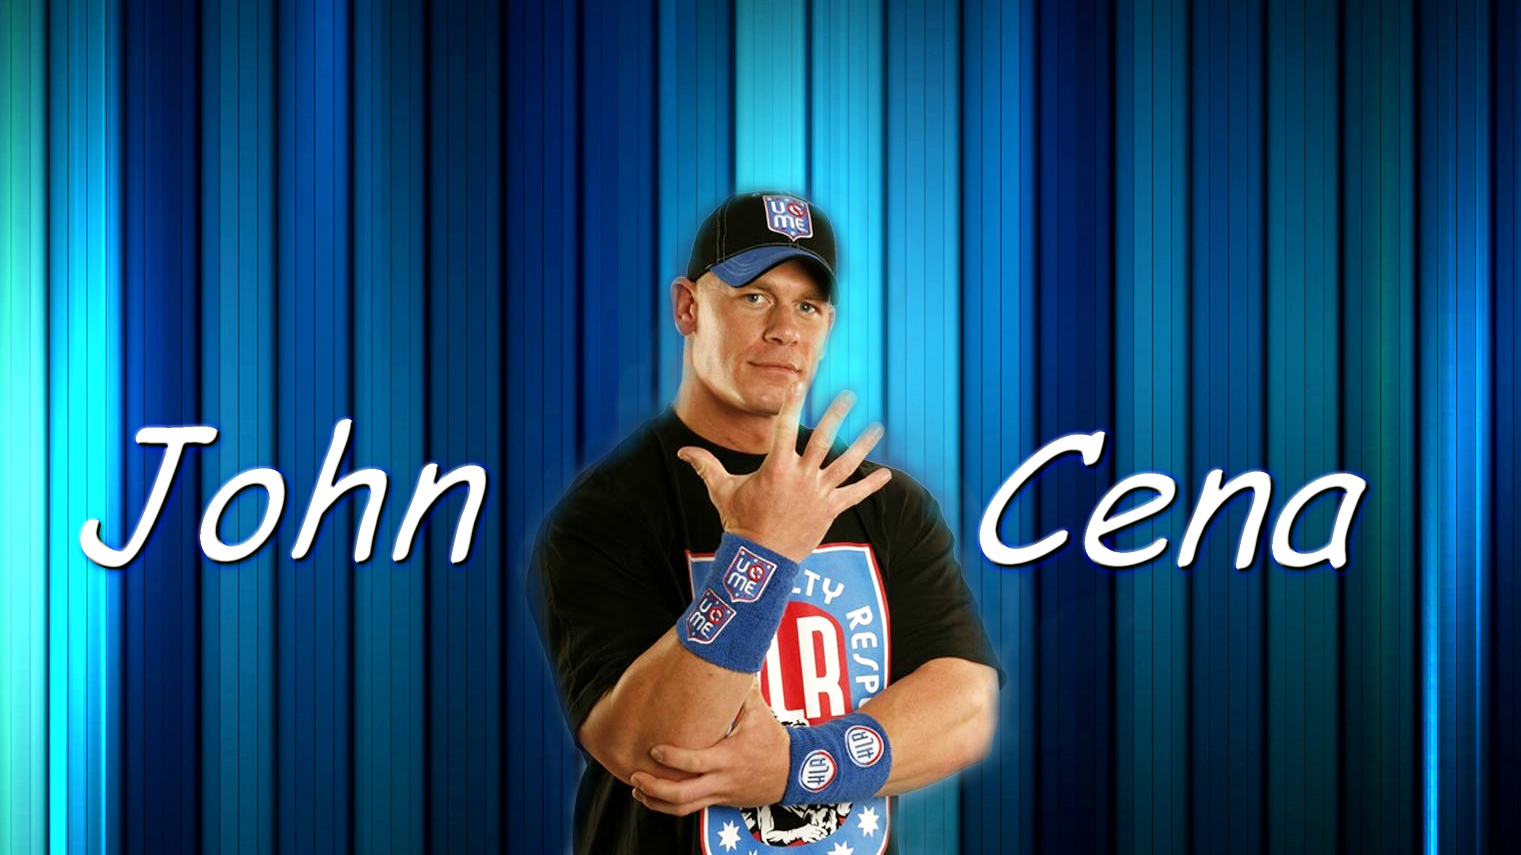 John Cena Logo  Download 305 Logos Page 1  Vectorme